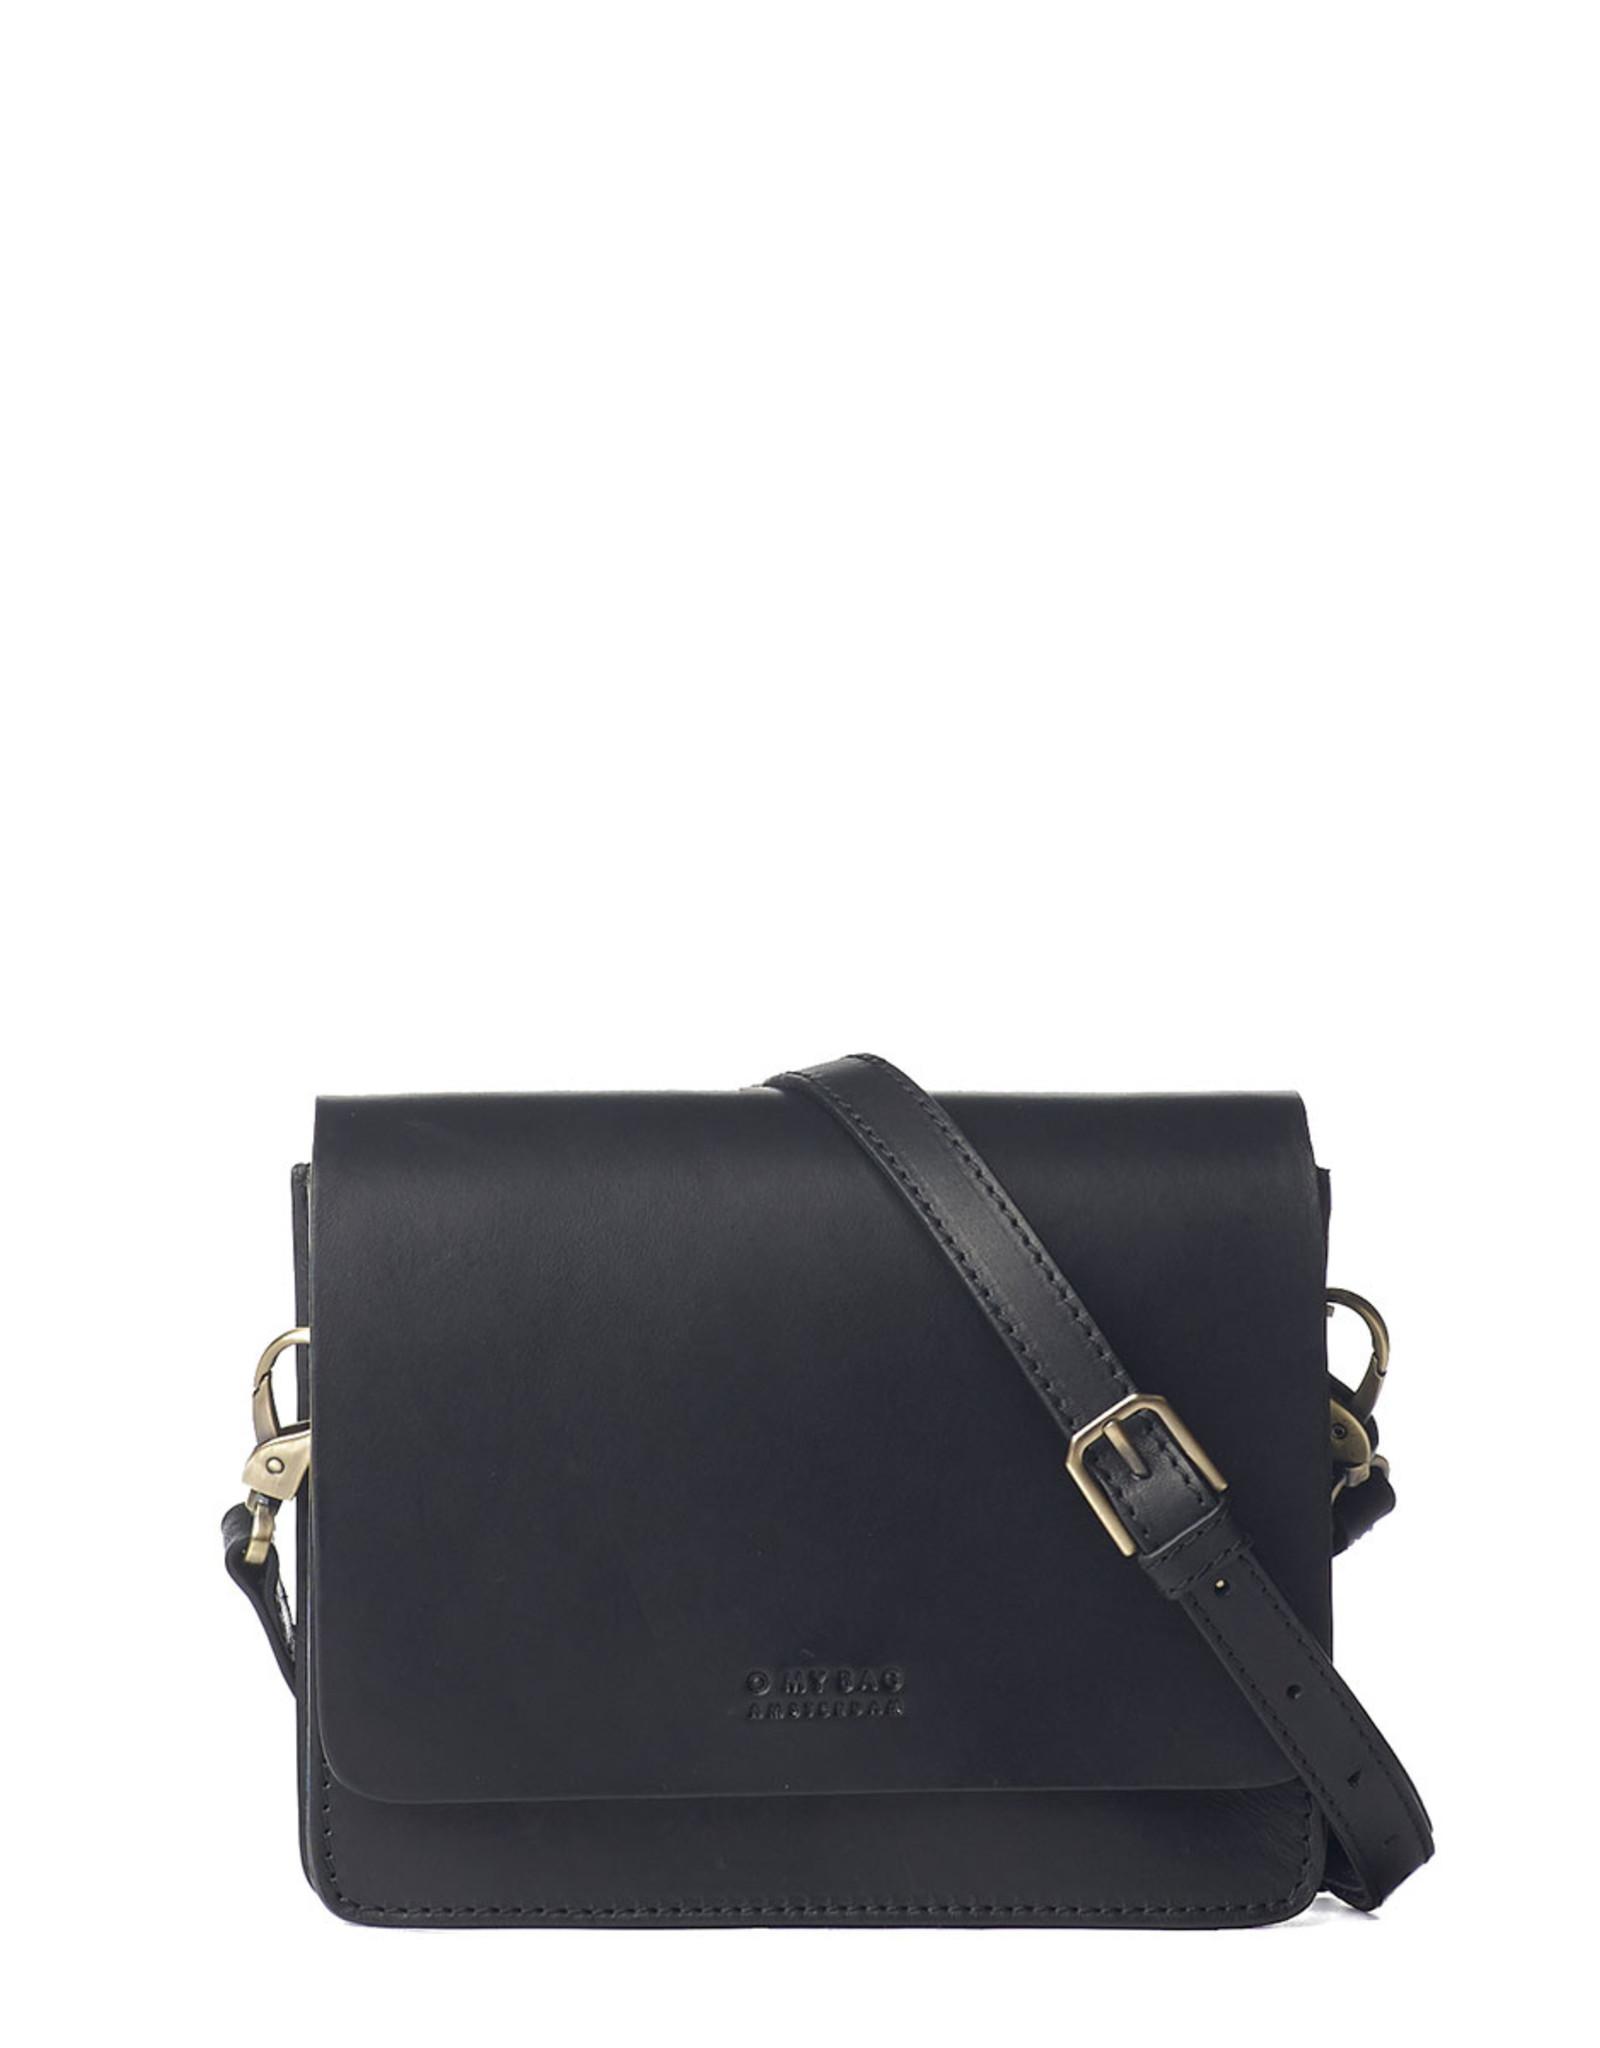 OMyBag Audrey Mini Classic Black Checkered Strap